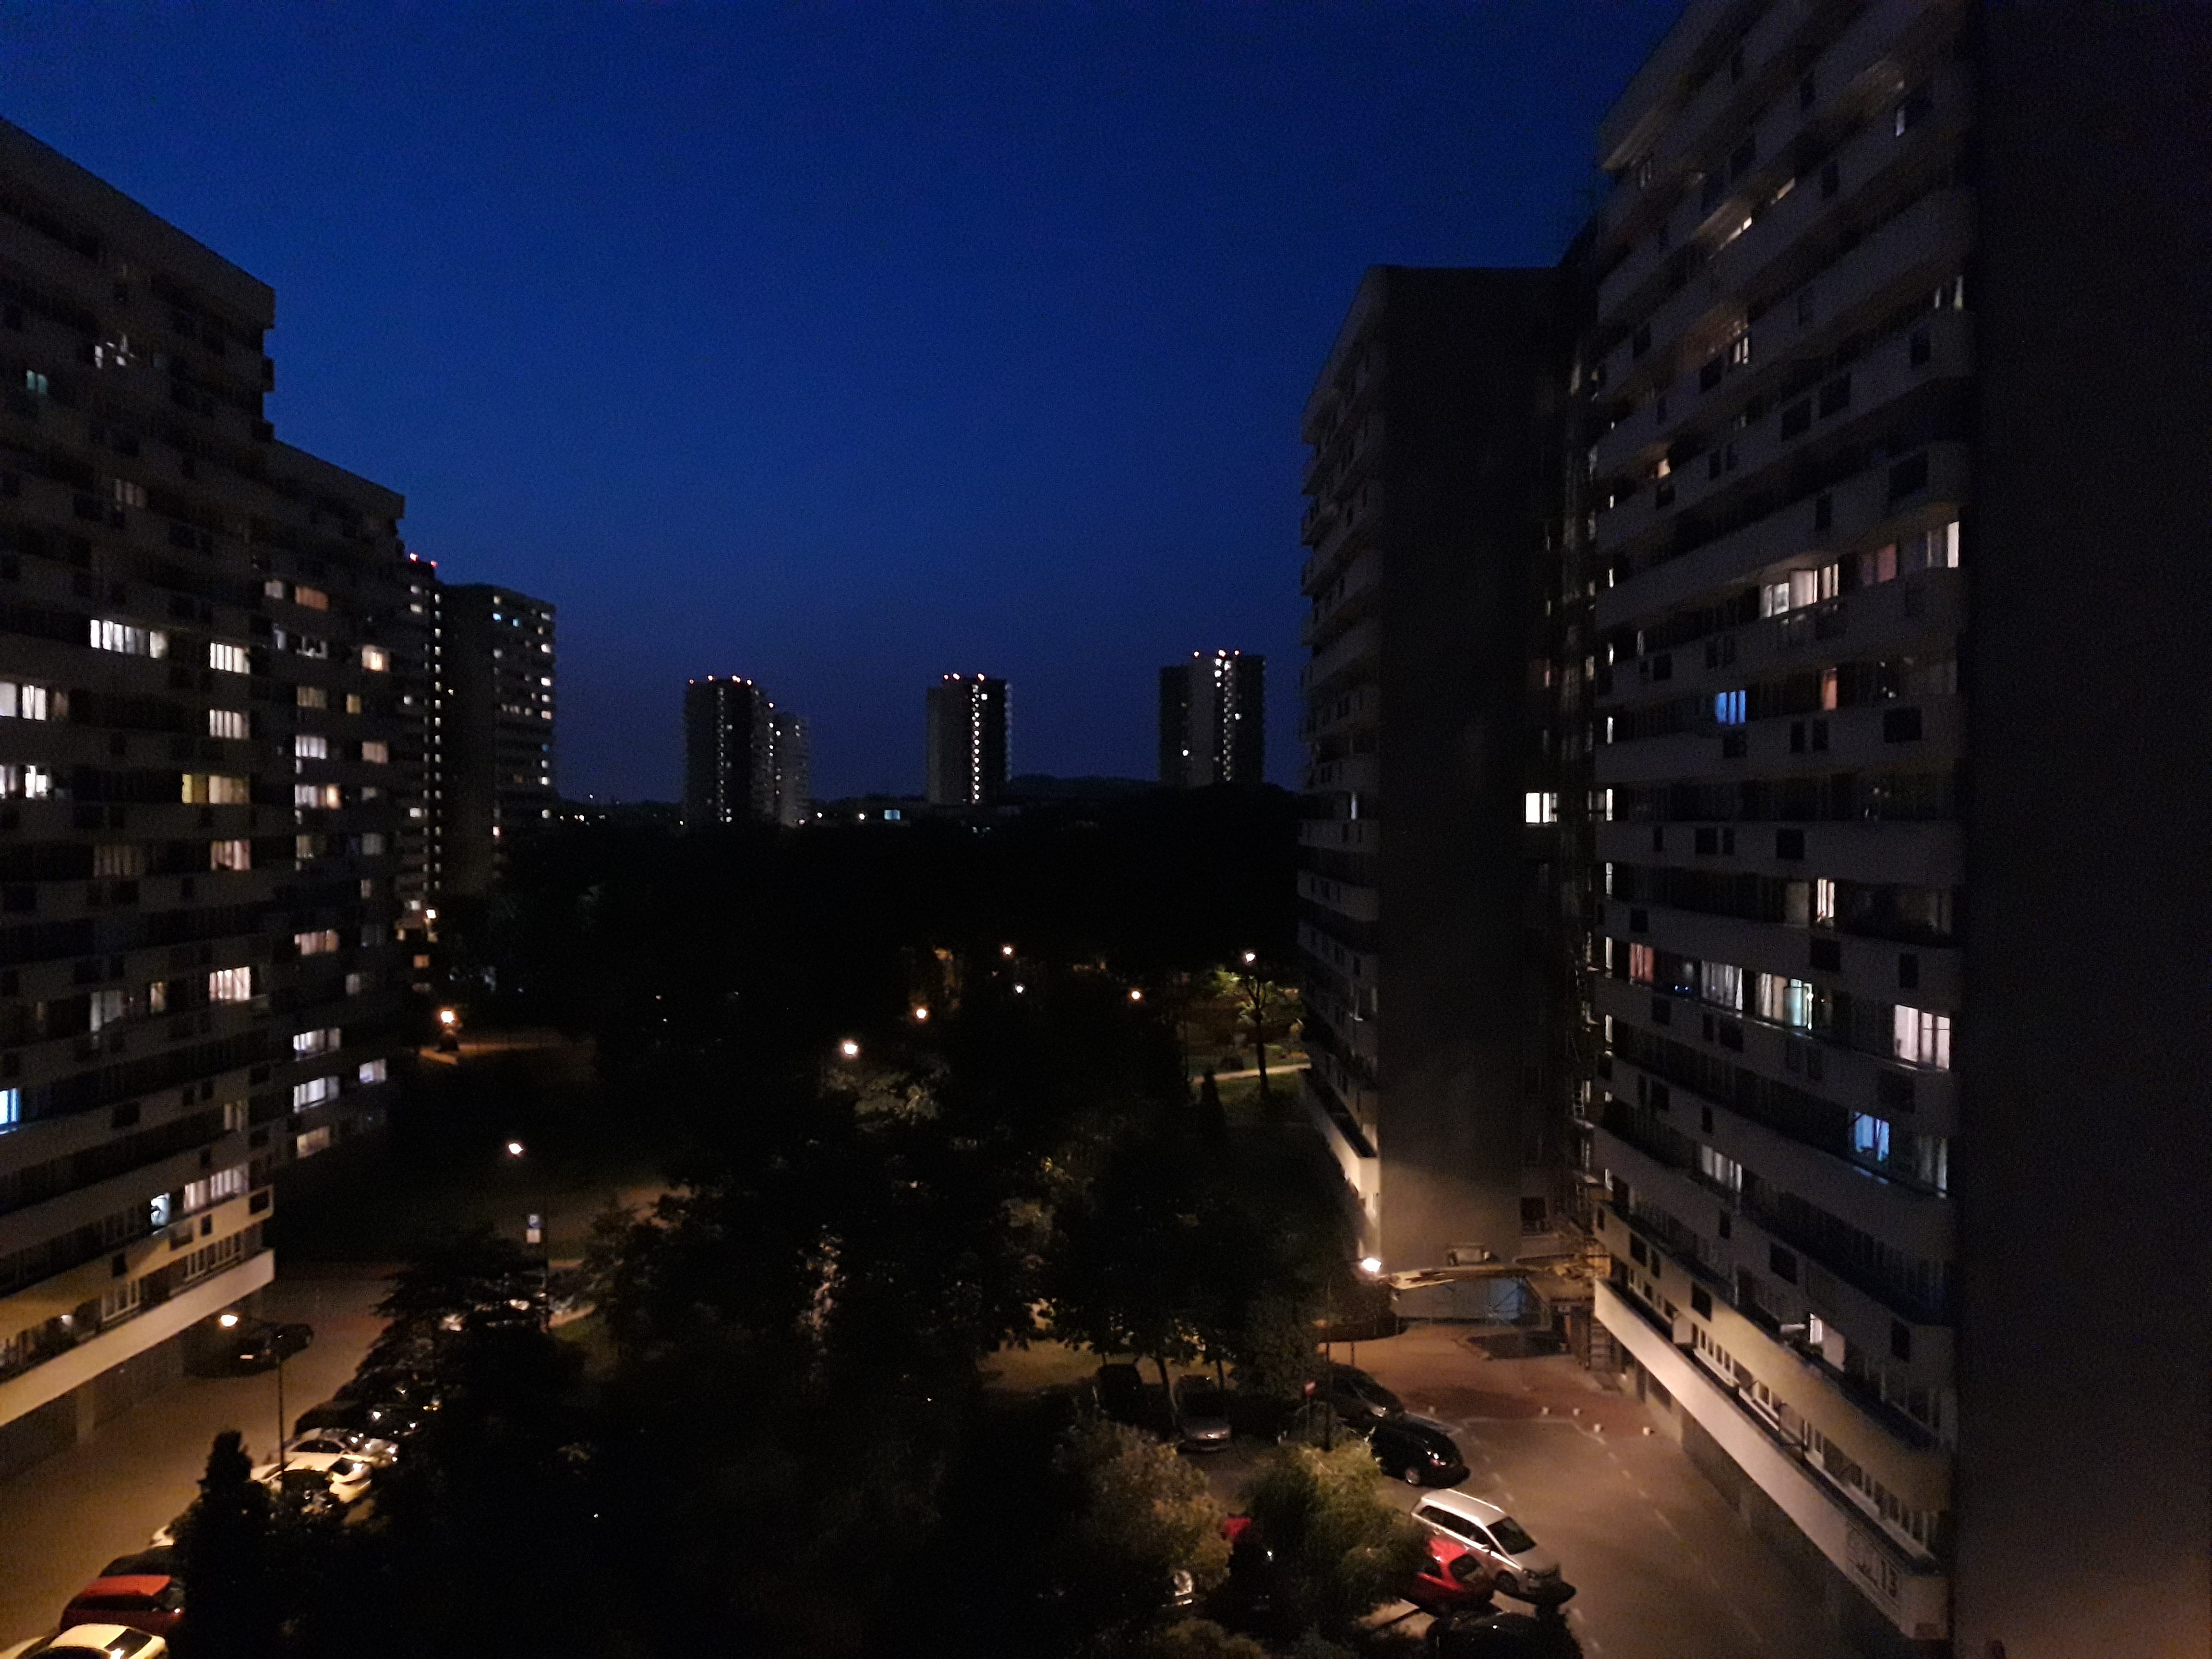 Zdjęcia nocne - Samsung Galaxy A6